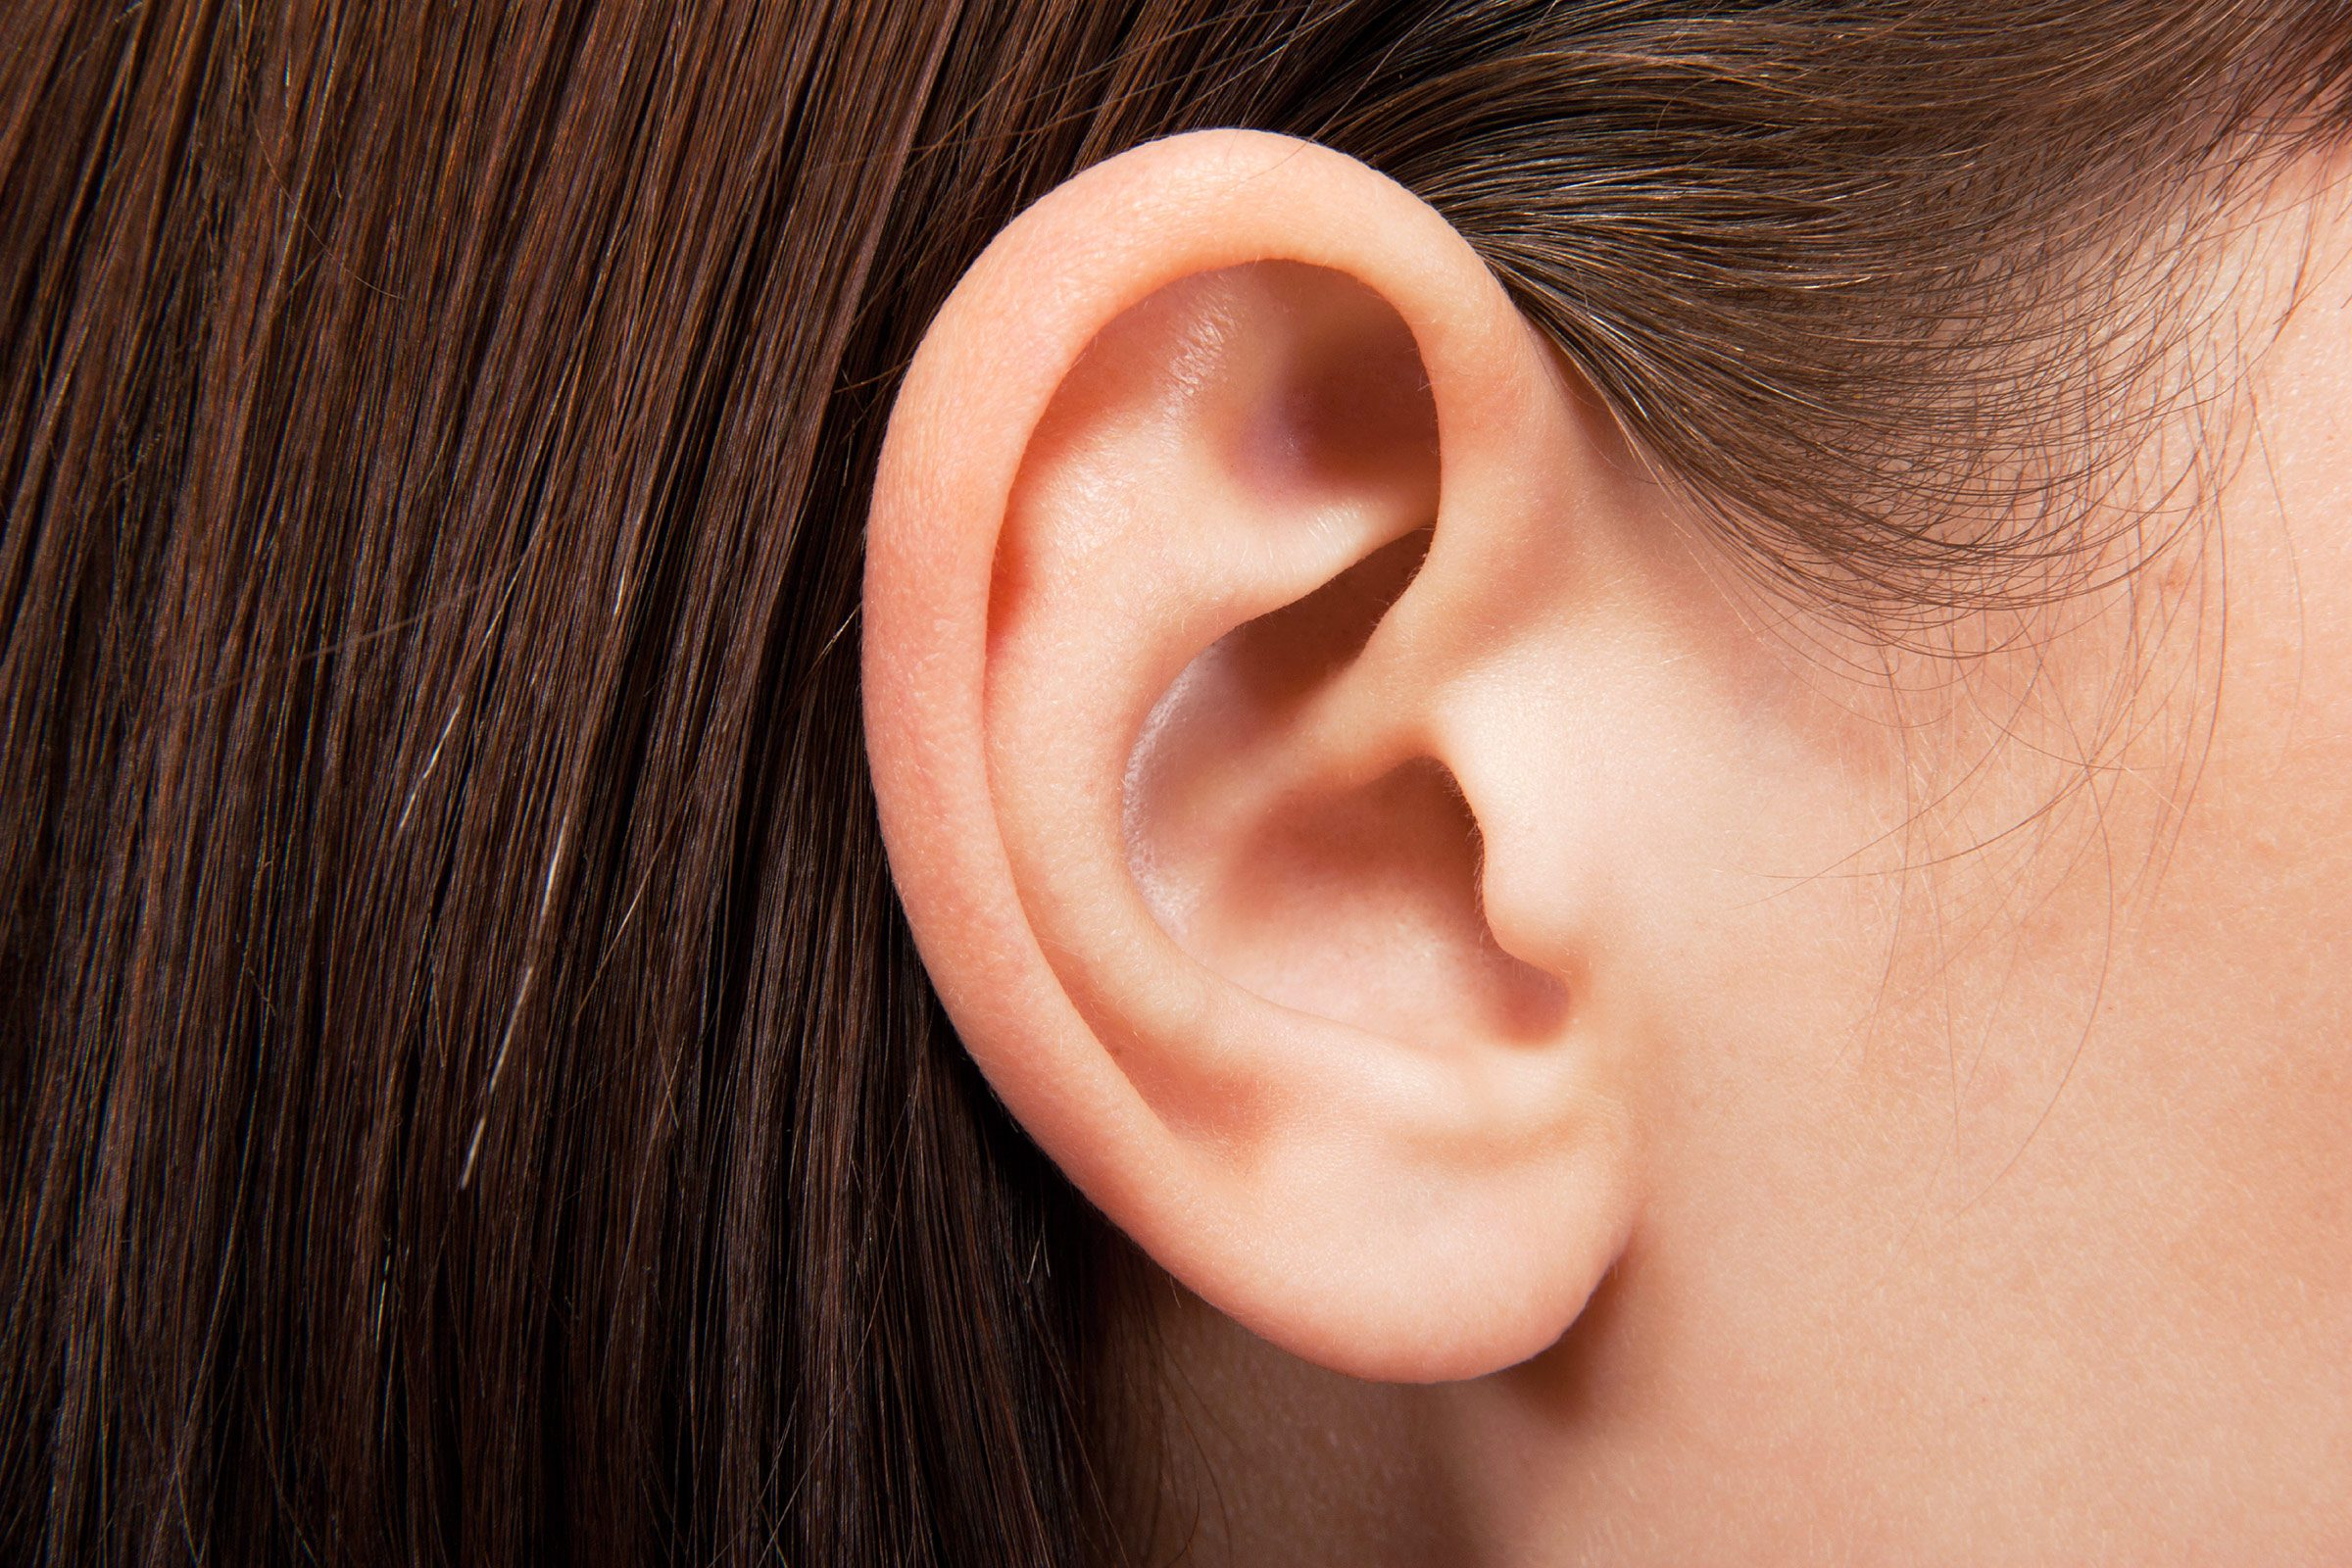 concussion symptoms woman ear